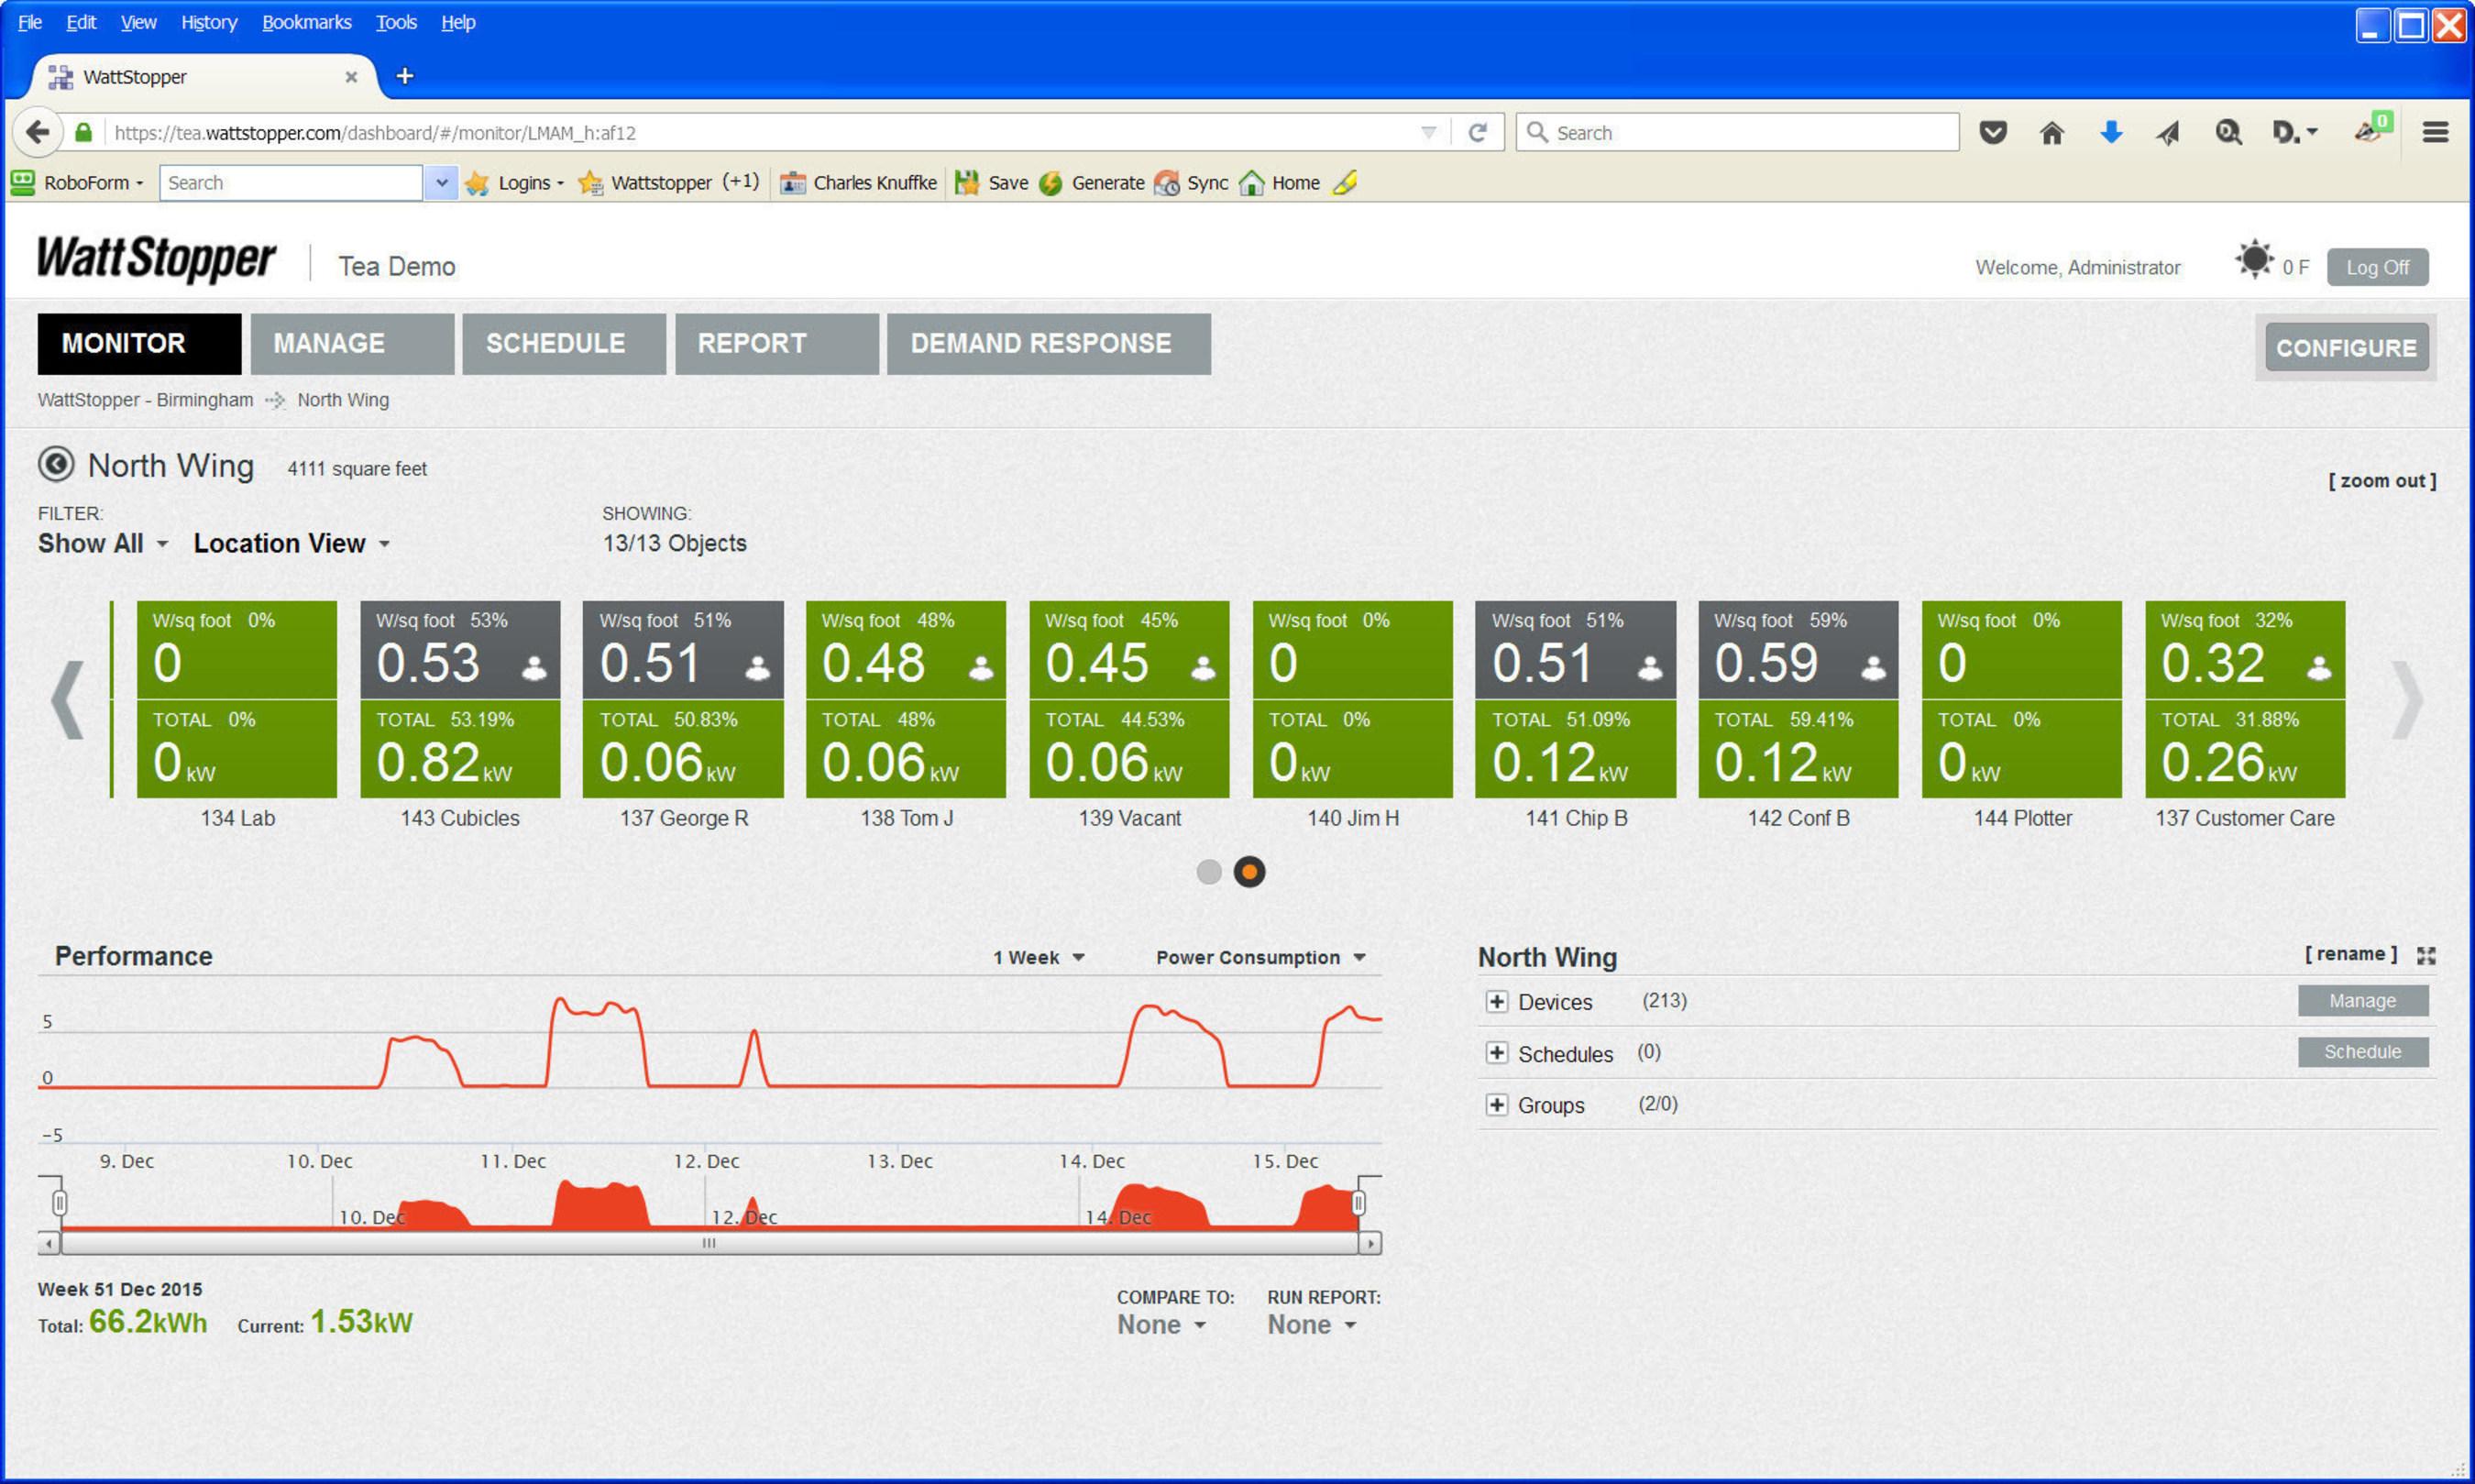 Legrand Expands Capabilities of the Wattstopper Digital Lighting Management Platform